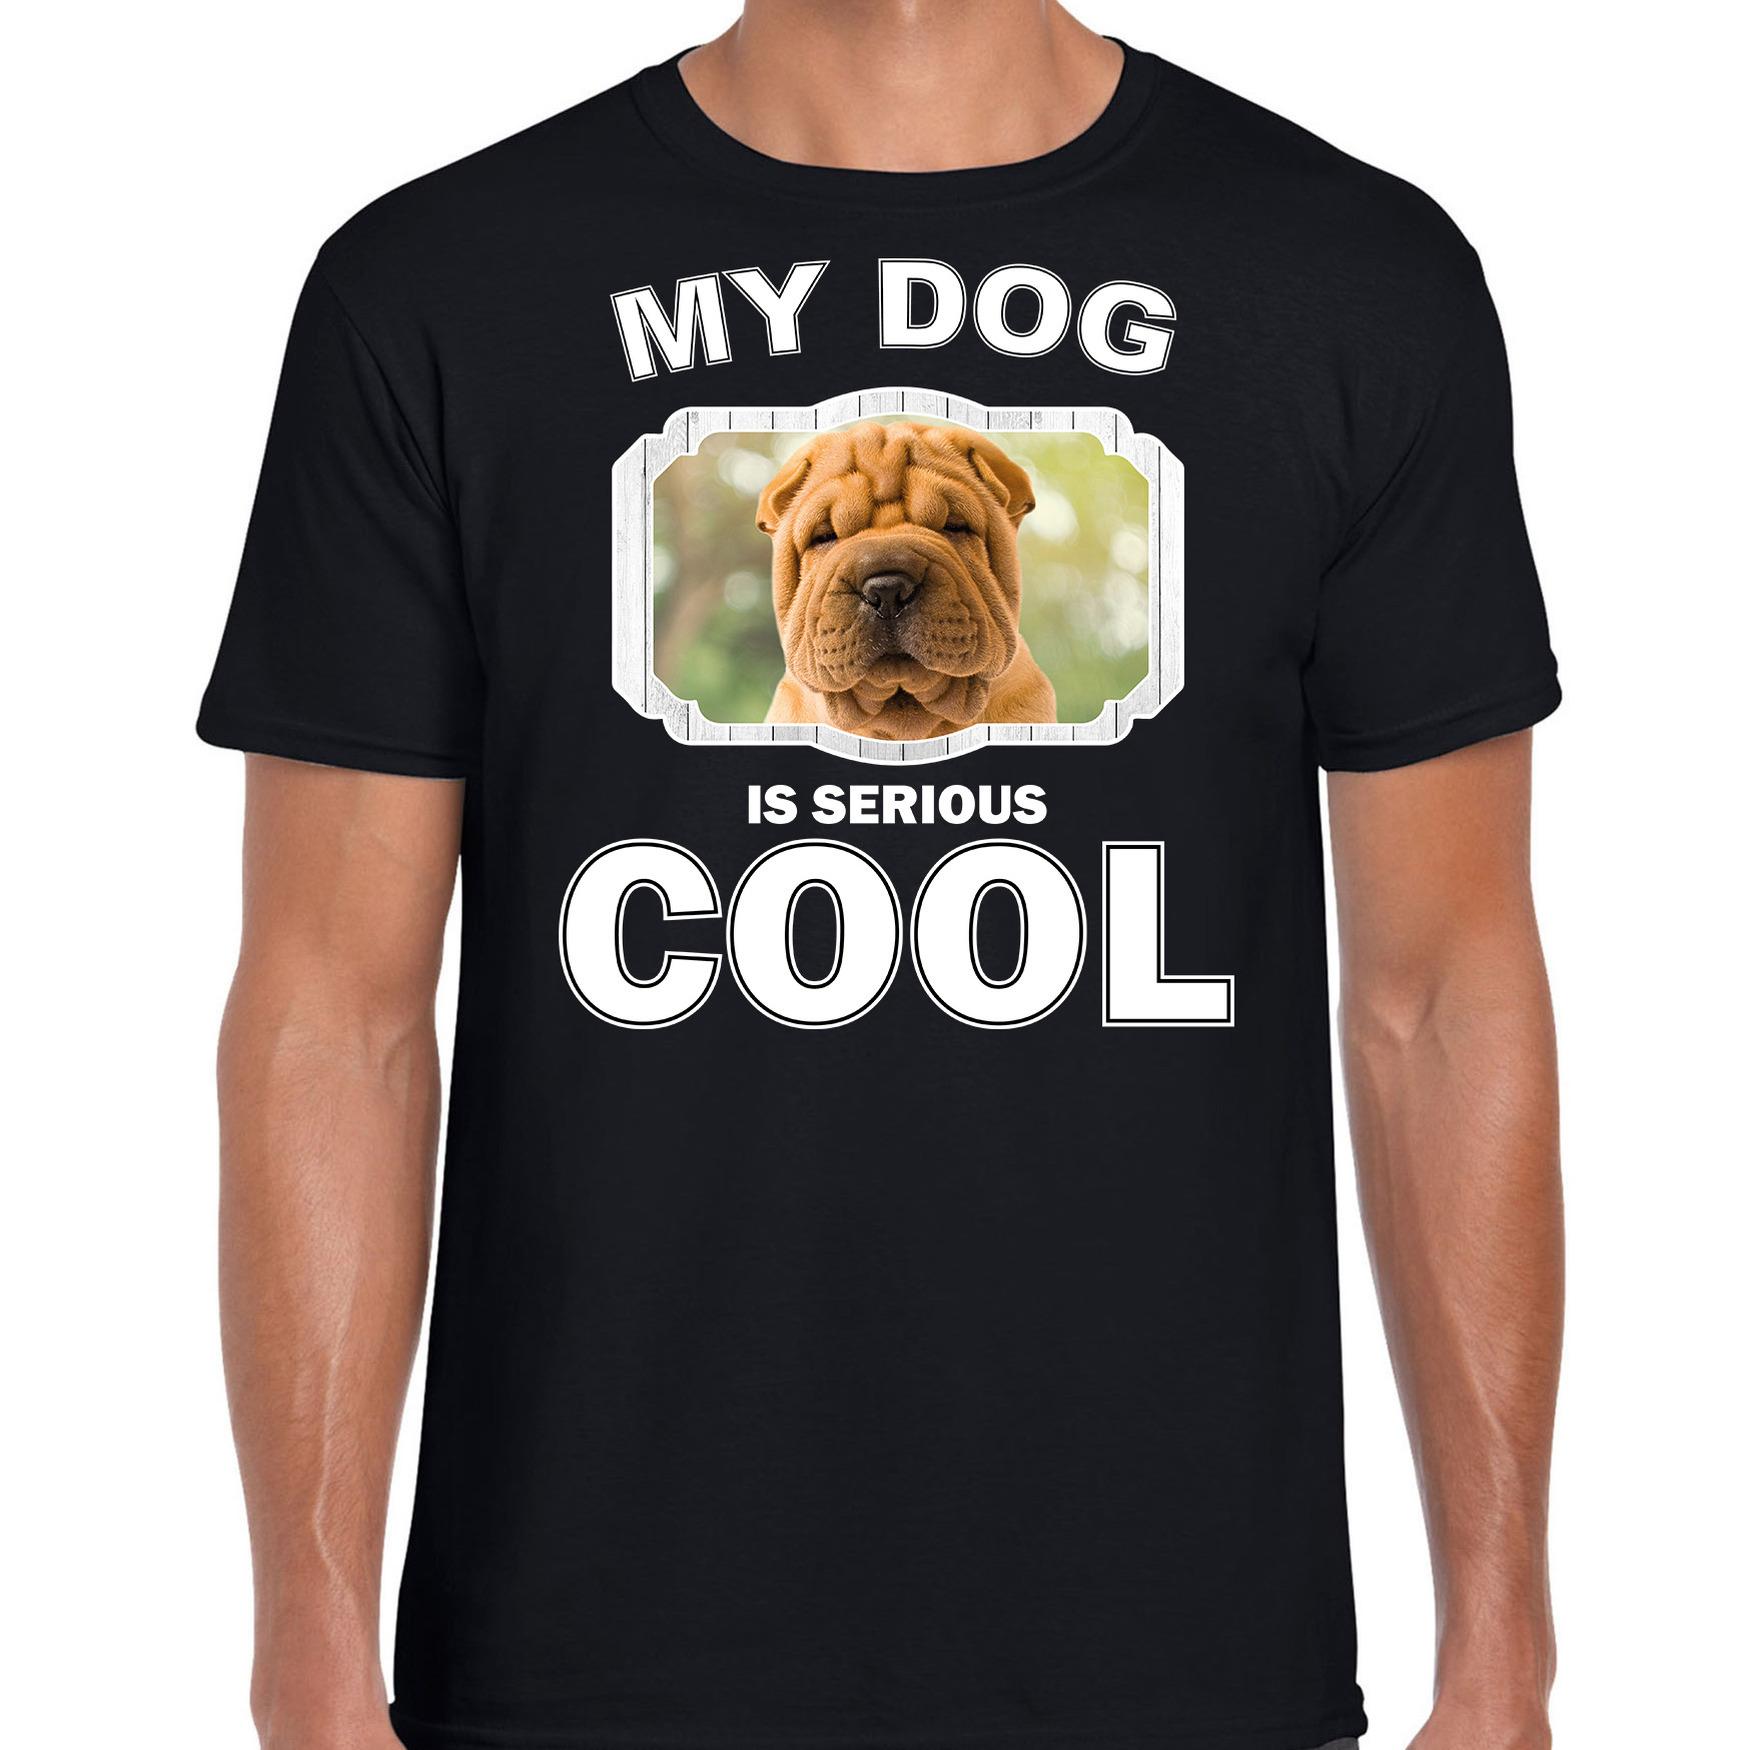 Honden liefhebber shirt Shar pei my dog is serious cool zwart voor heren